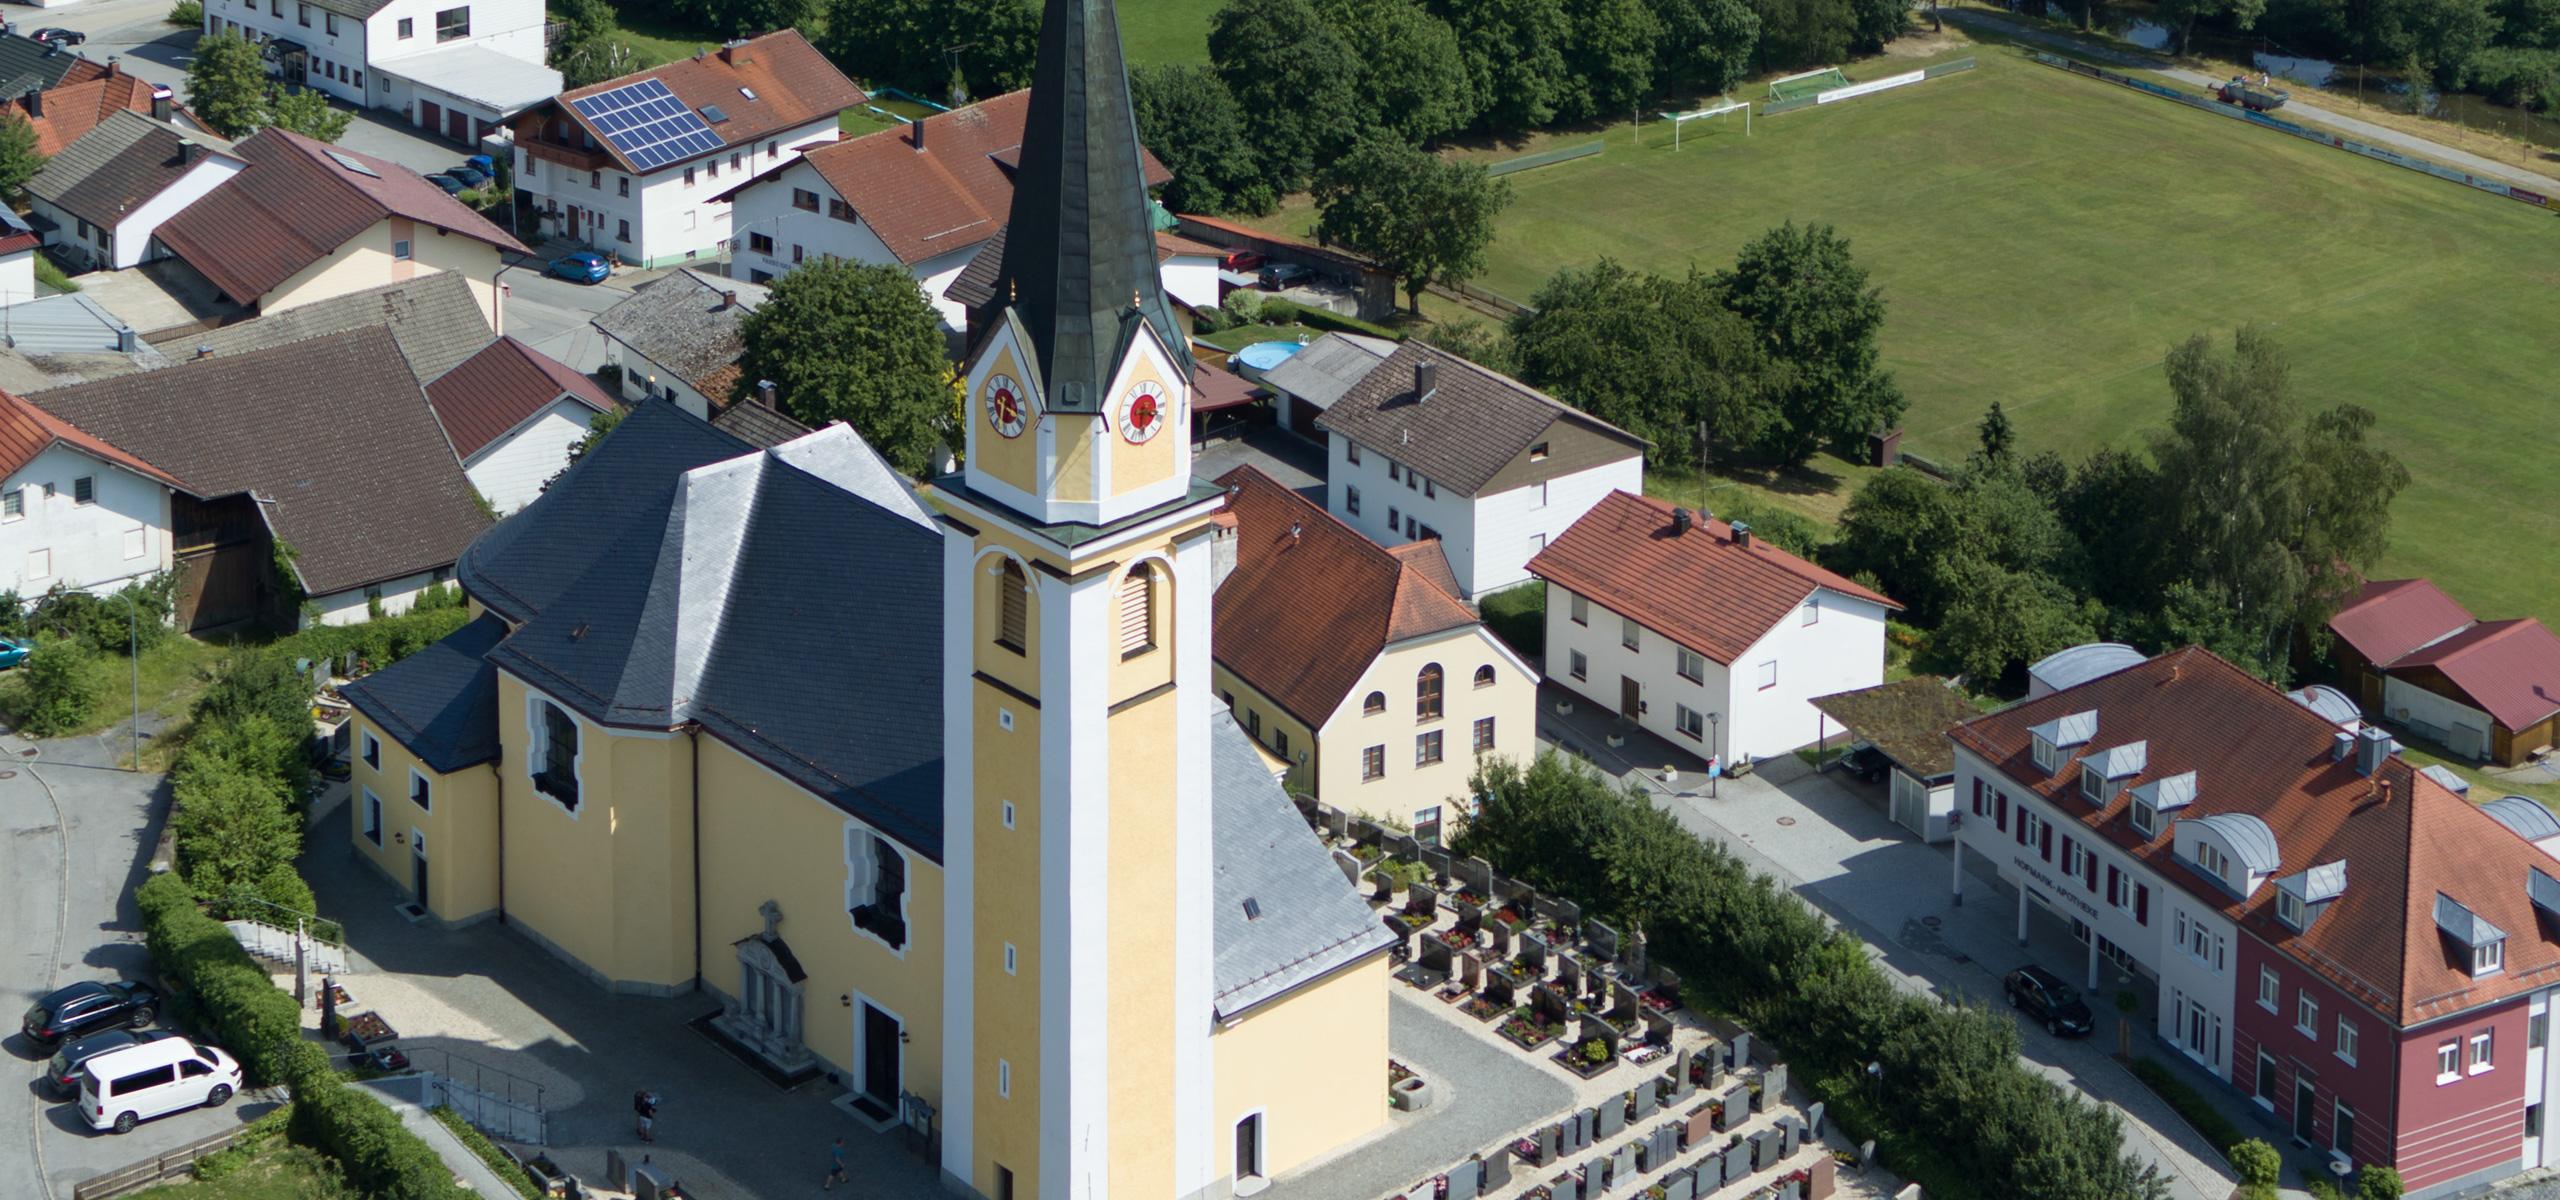 Außenrenovierung Pfarrkirche Aicha v. W.